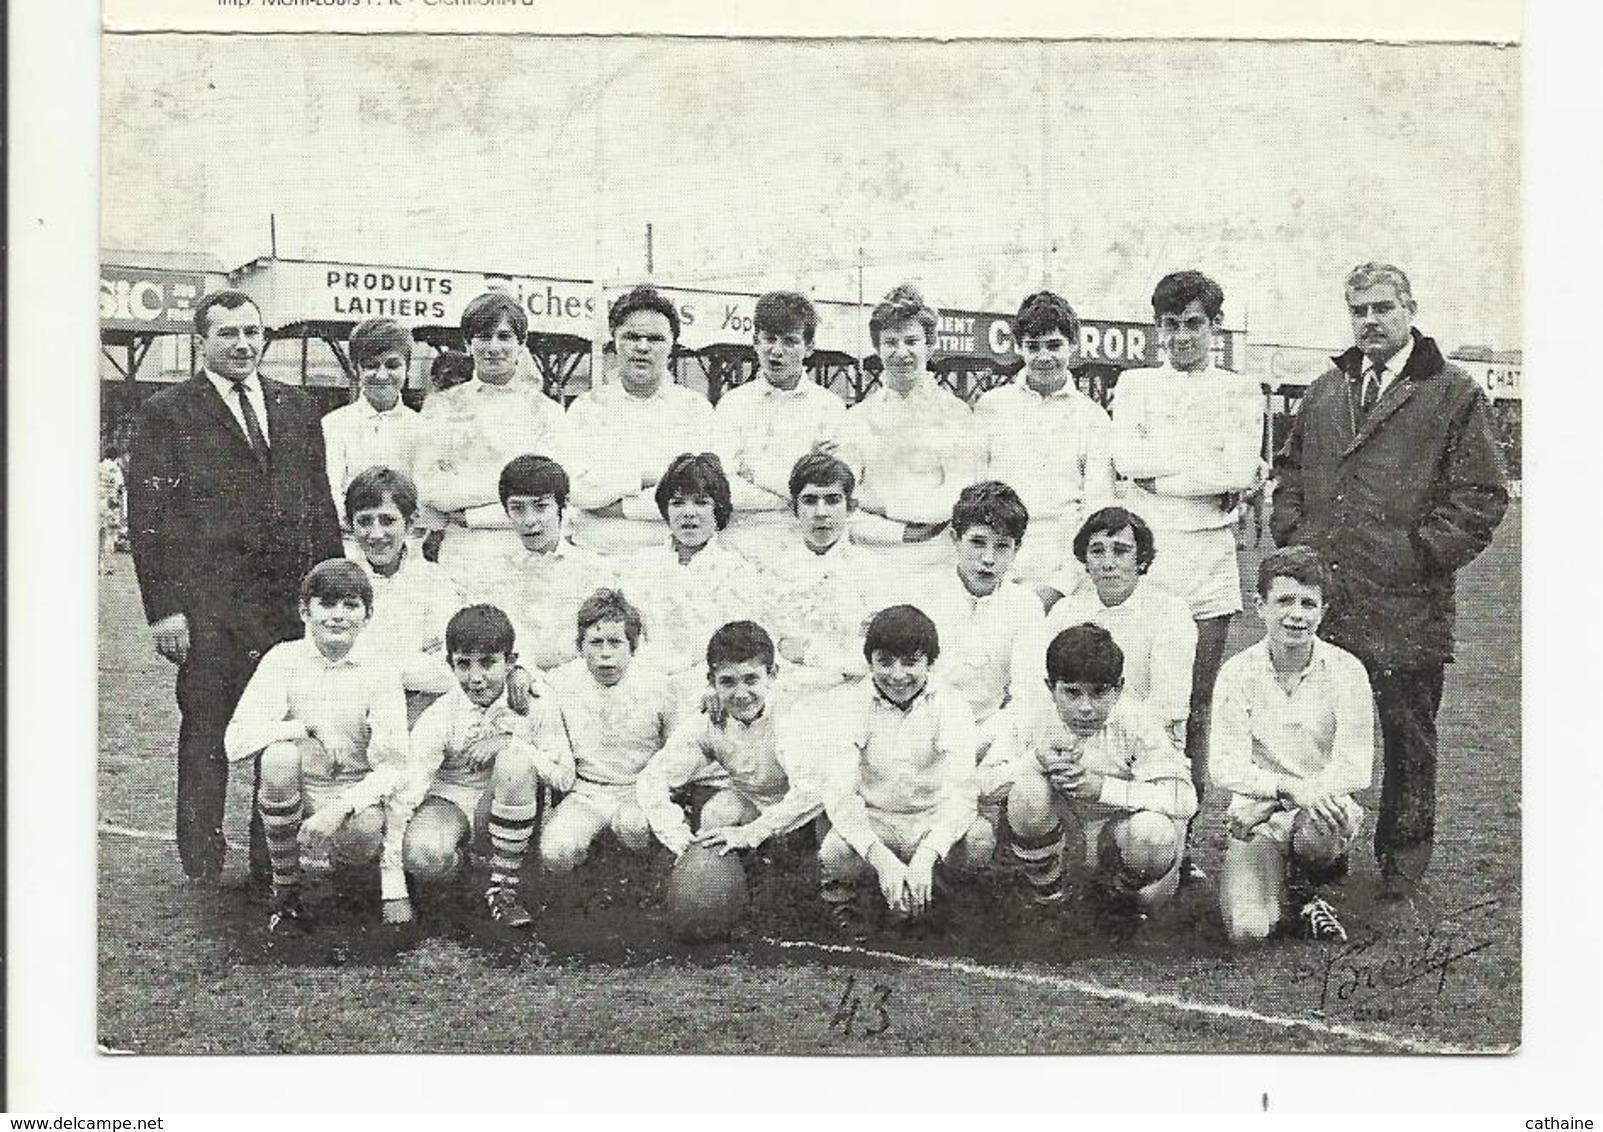 63 . BLANZAT . BLANZAT ATHLETIC CLUB . ECOLE DE RUGBY . CALENDRIER 1970 . PHOTO DE L EQUIPE - Calendriers